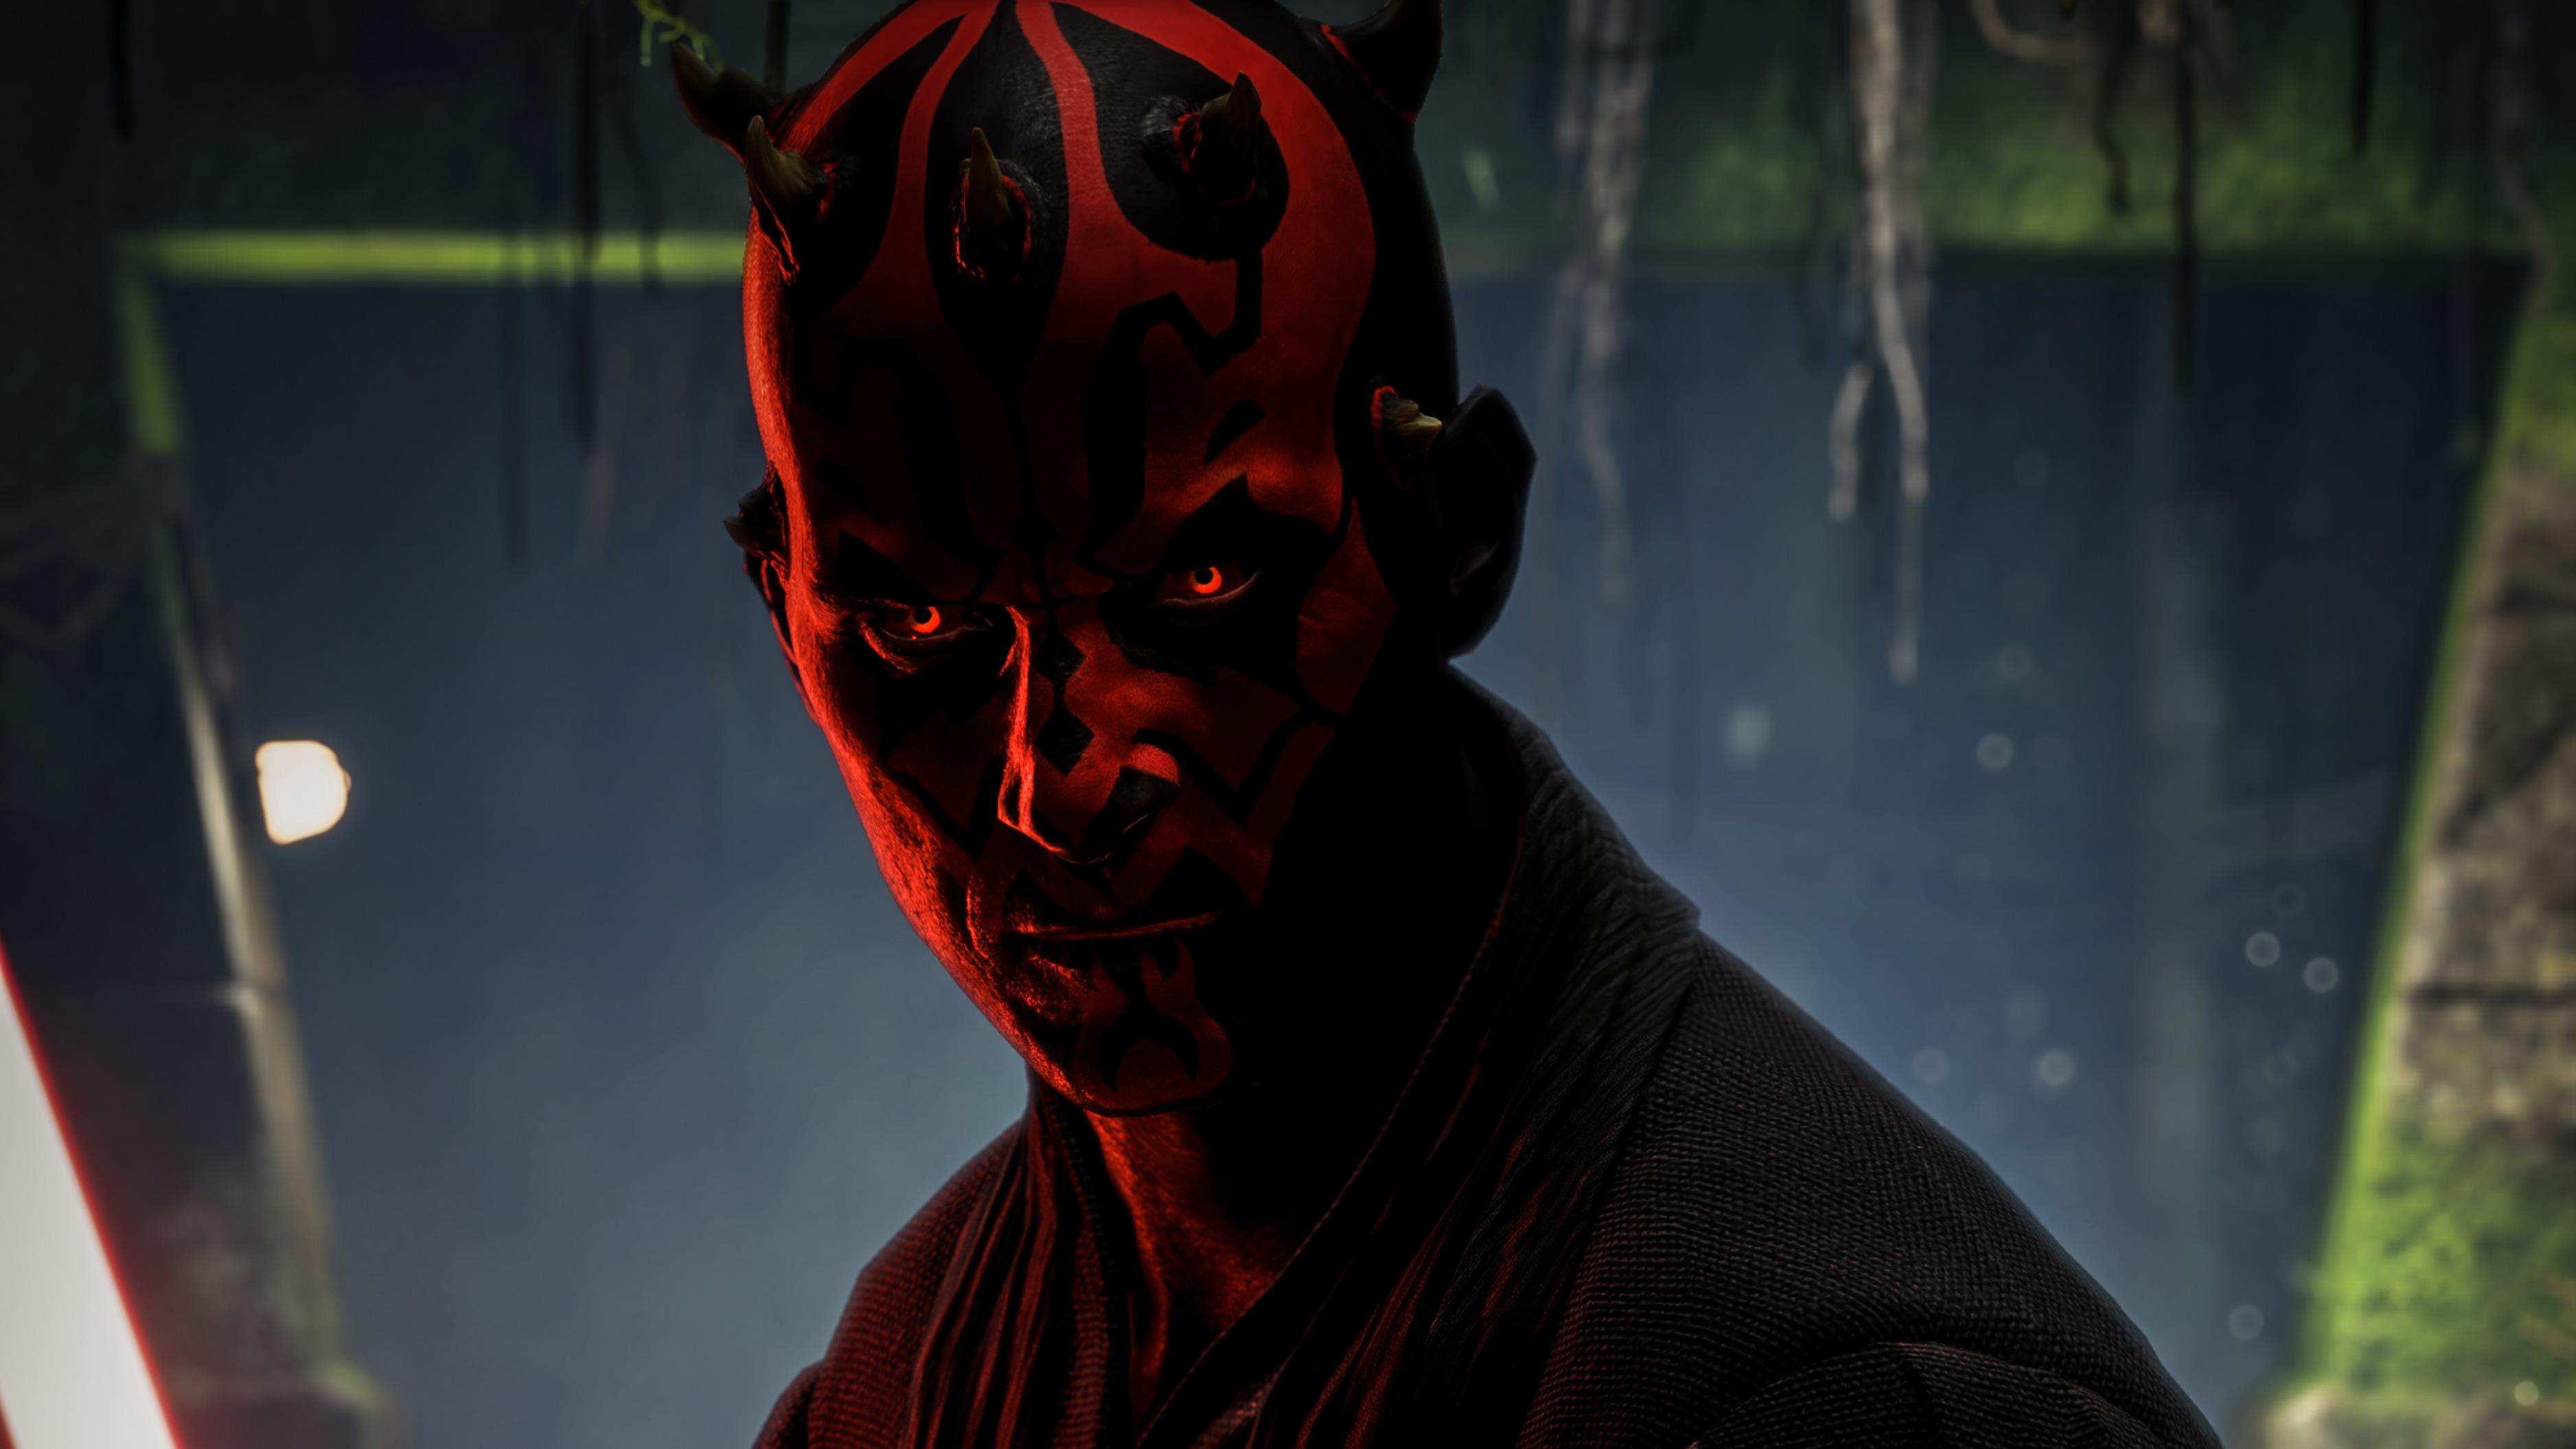 Darth Maul Star Wars Battlefront 2 4k, HD Games, 4k ...